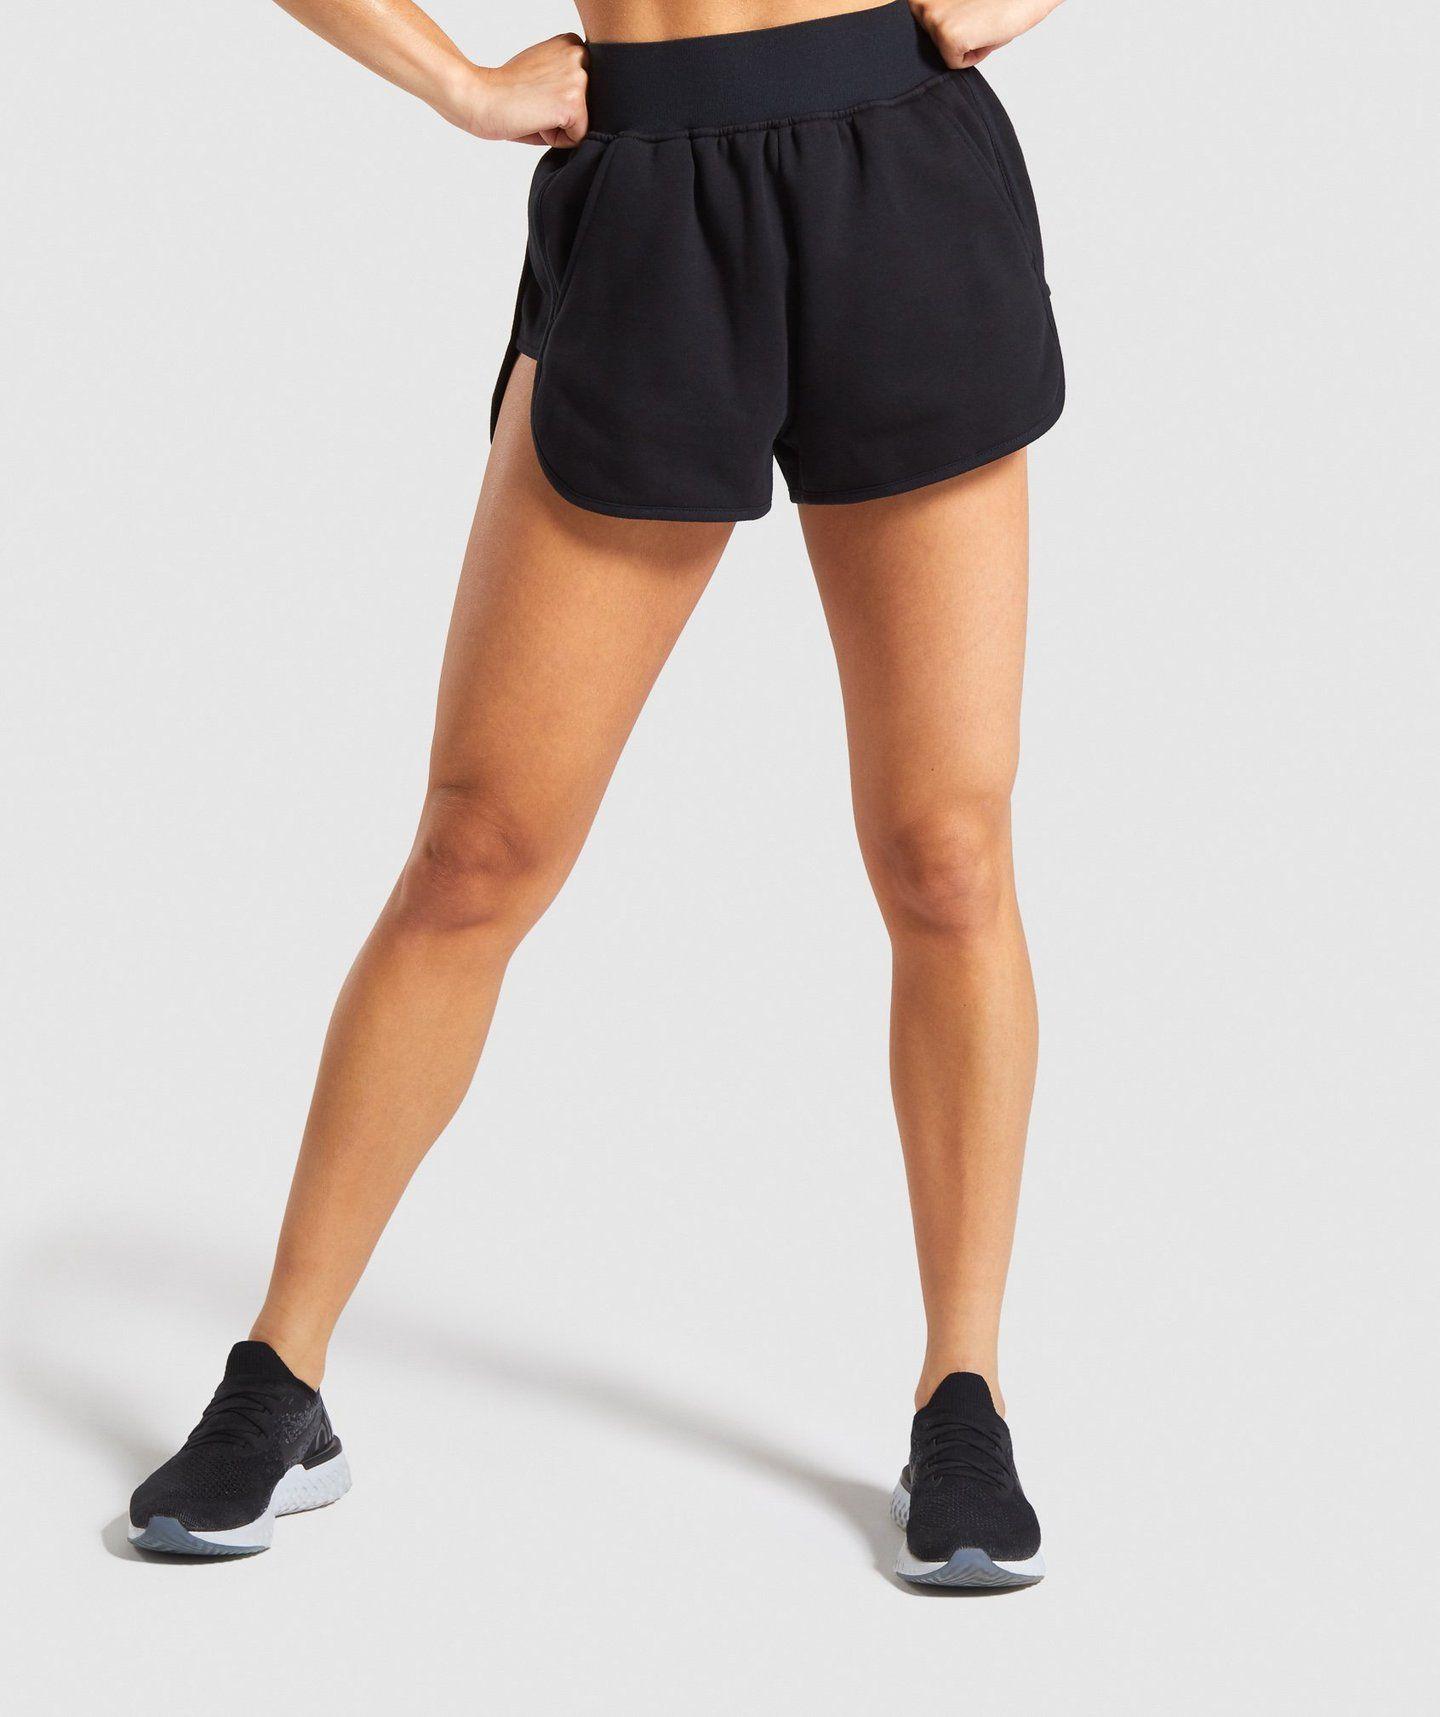 Gymshark Legacy Fitness Shorts Black New Releases